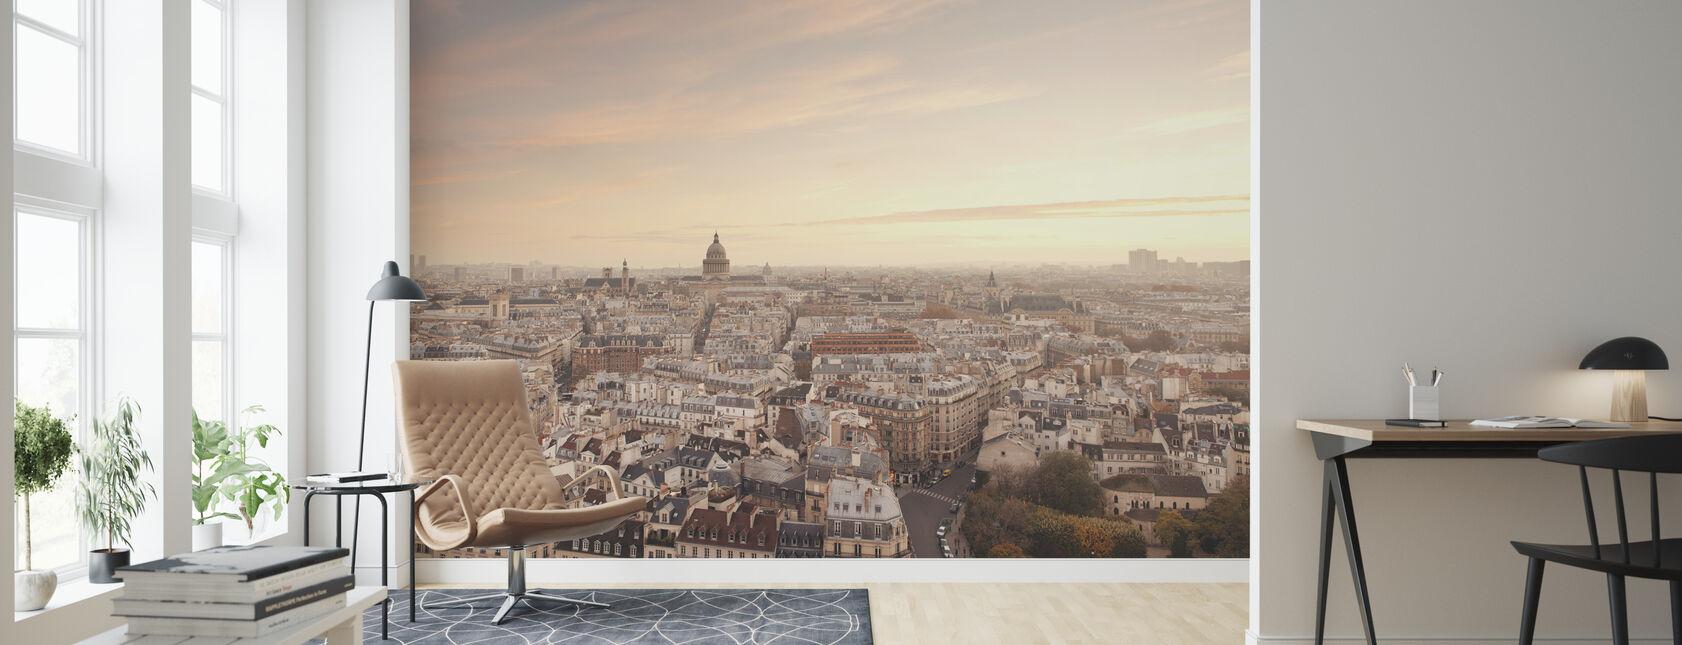 Sunset over Paris - Wallpaper - Living Room